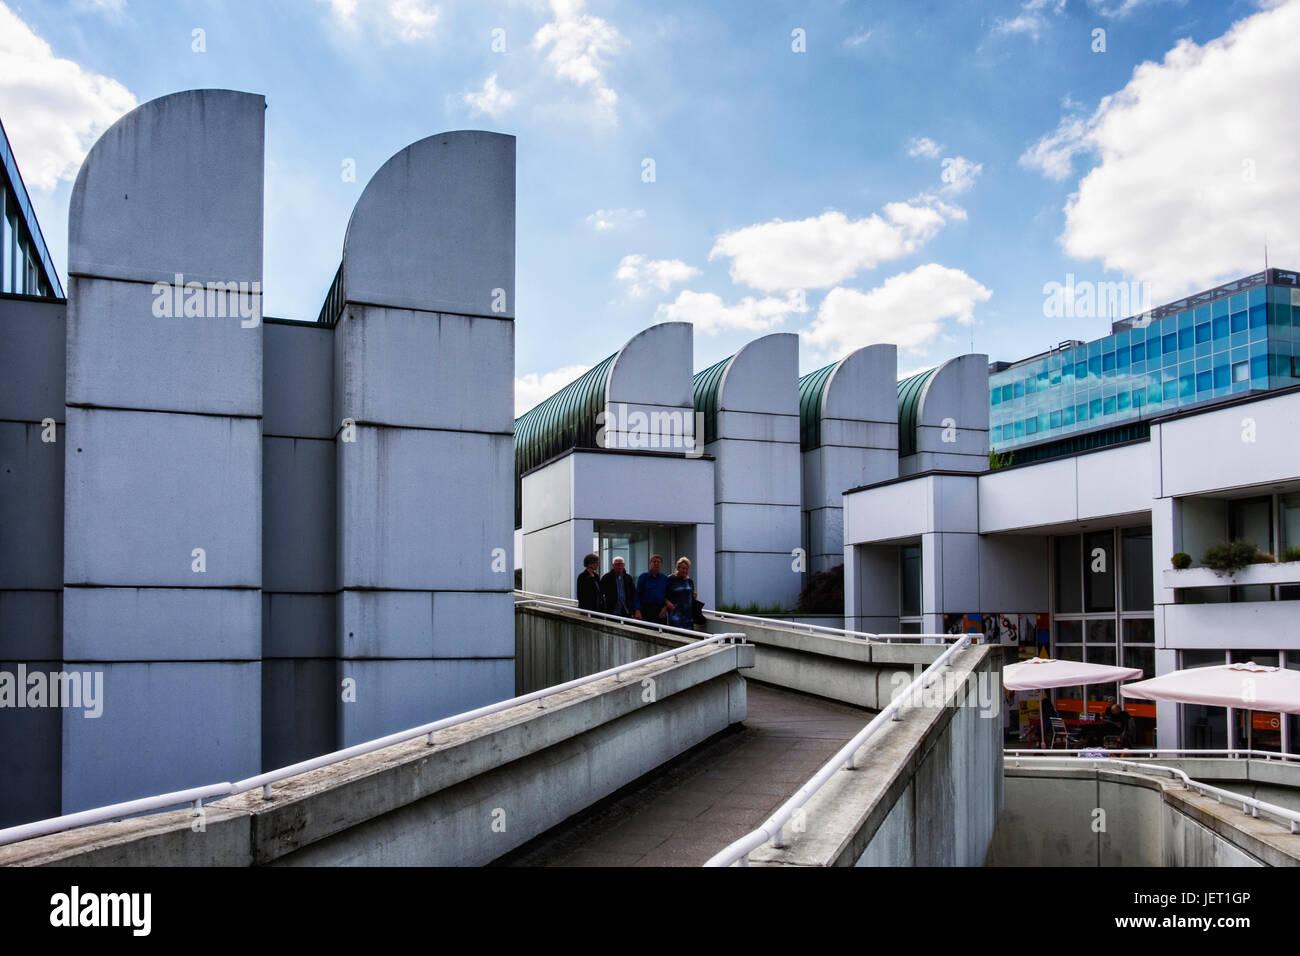 Berlin,Tiergarten.The Bauhaus building, Bauhaus Archive,Museum of design is a documentation centre with exhibition - Stock Image